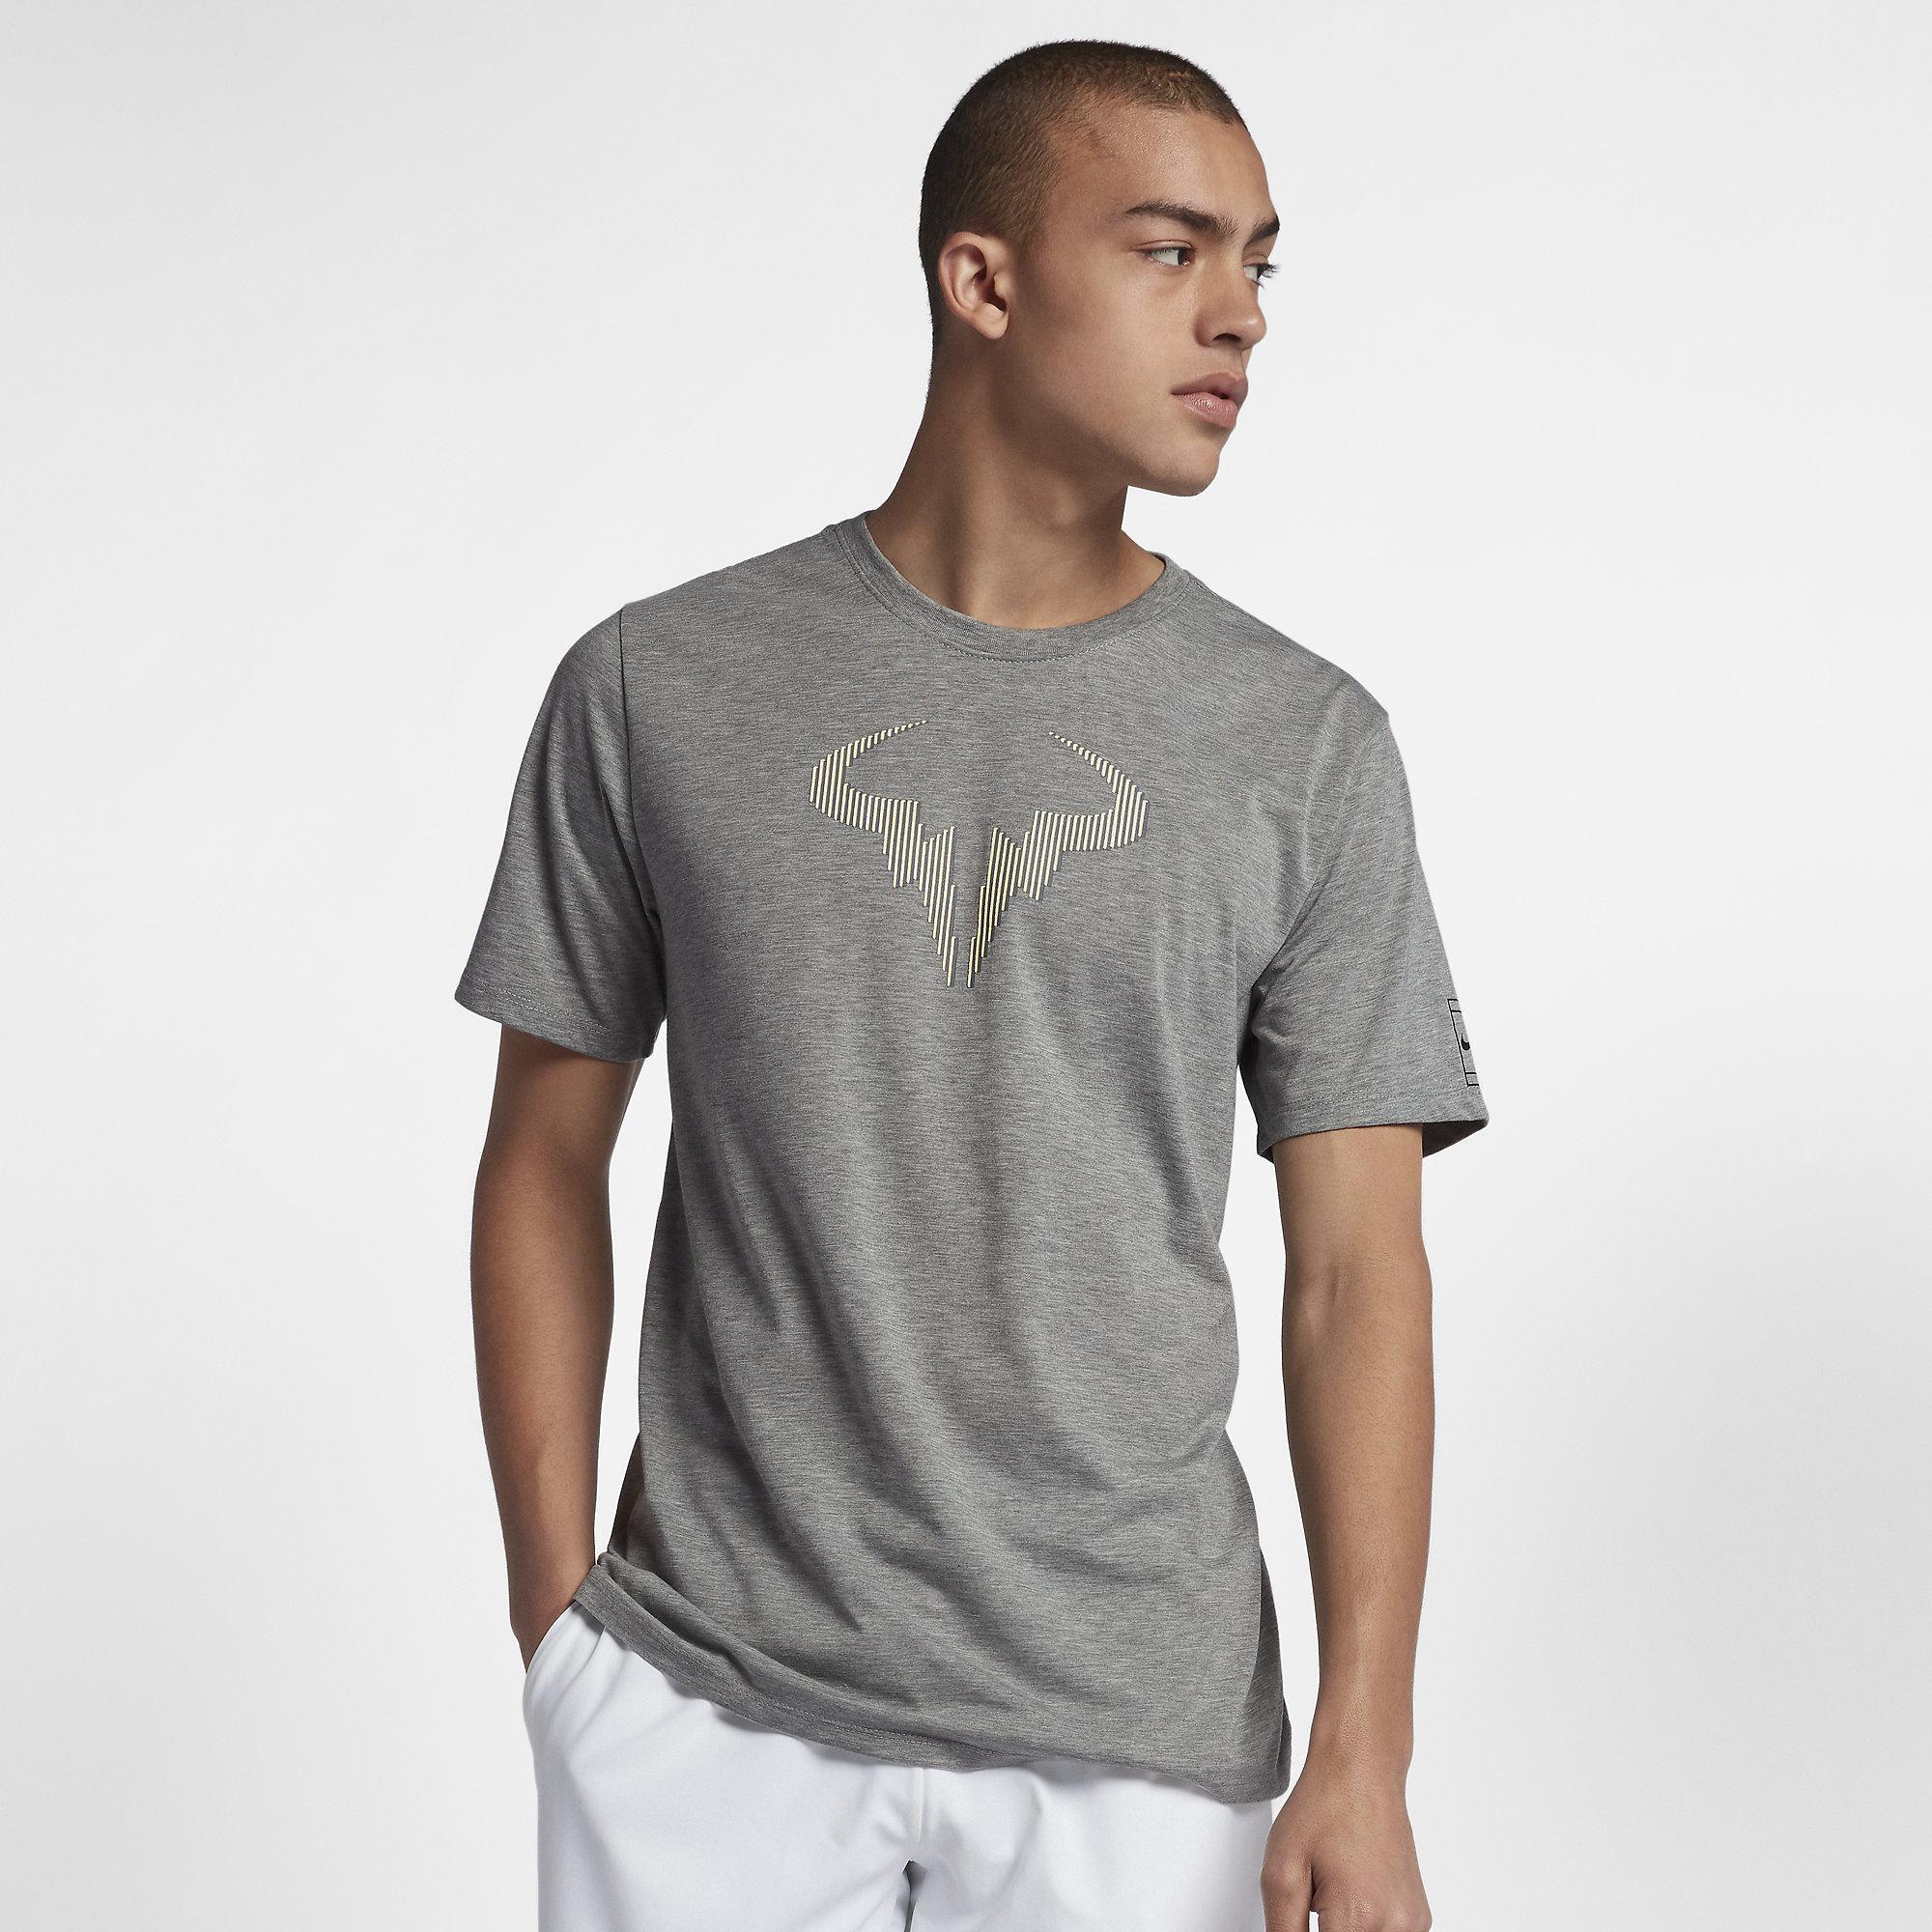 Nike mens dry rafa t shirt dark grey heather black for Mens heather grey t shirt